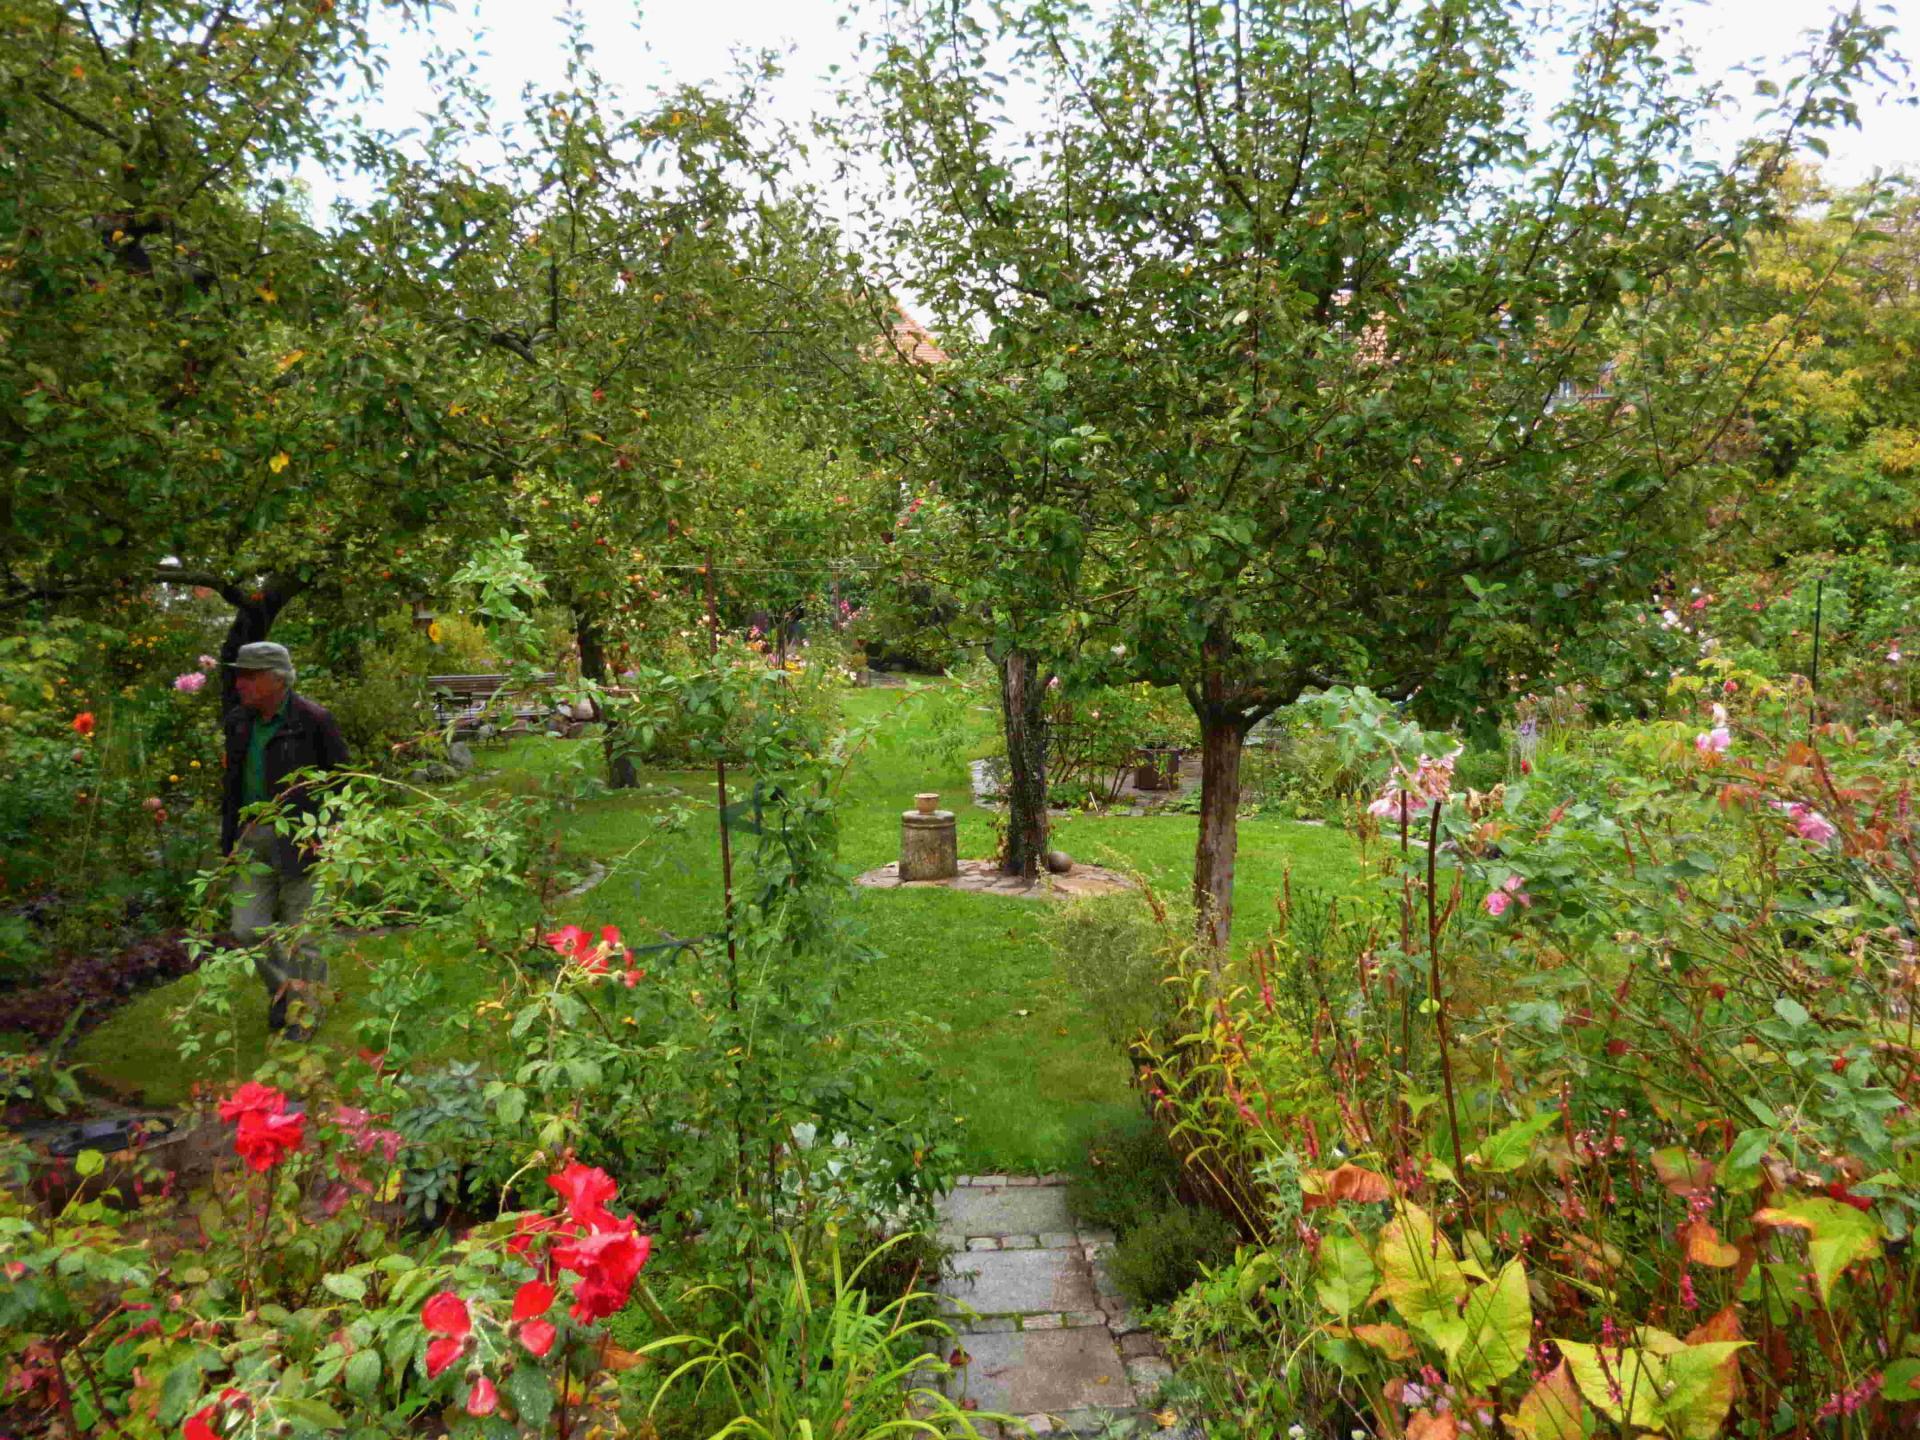 Offene Gartenpfporte 26-09-2020 Bild 17